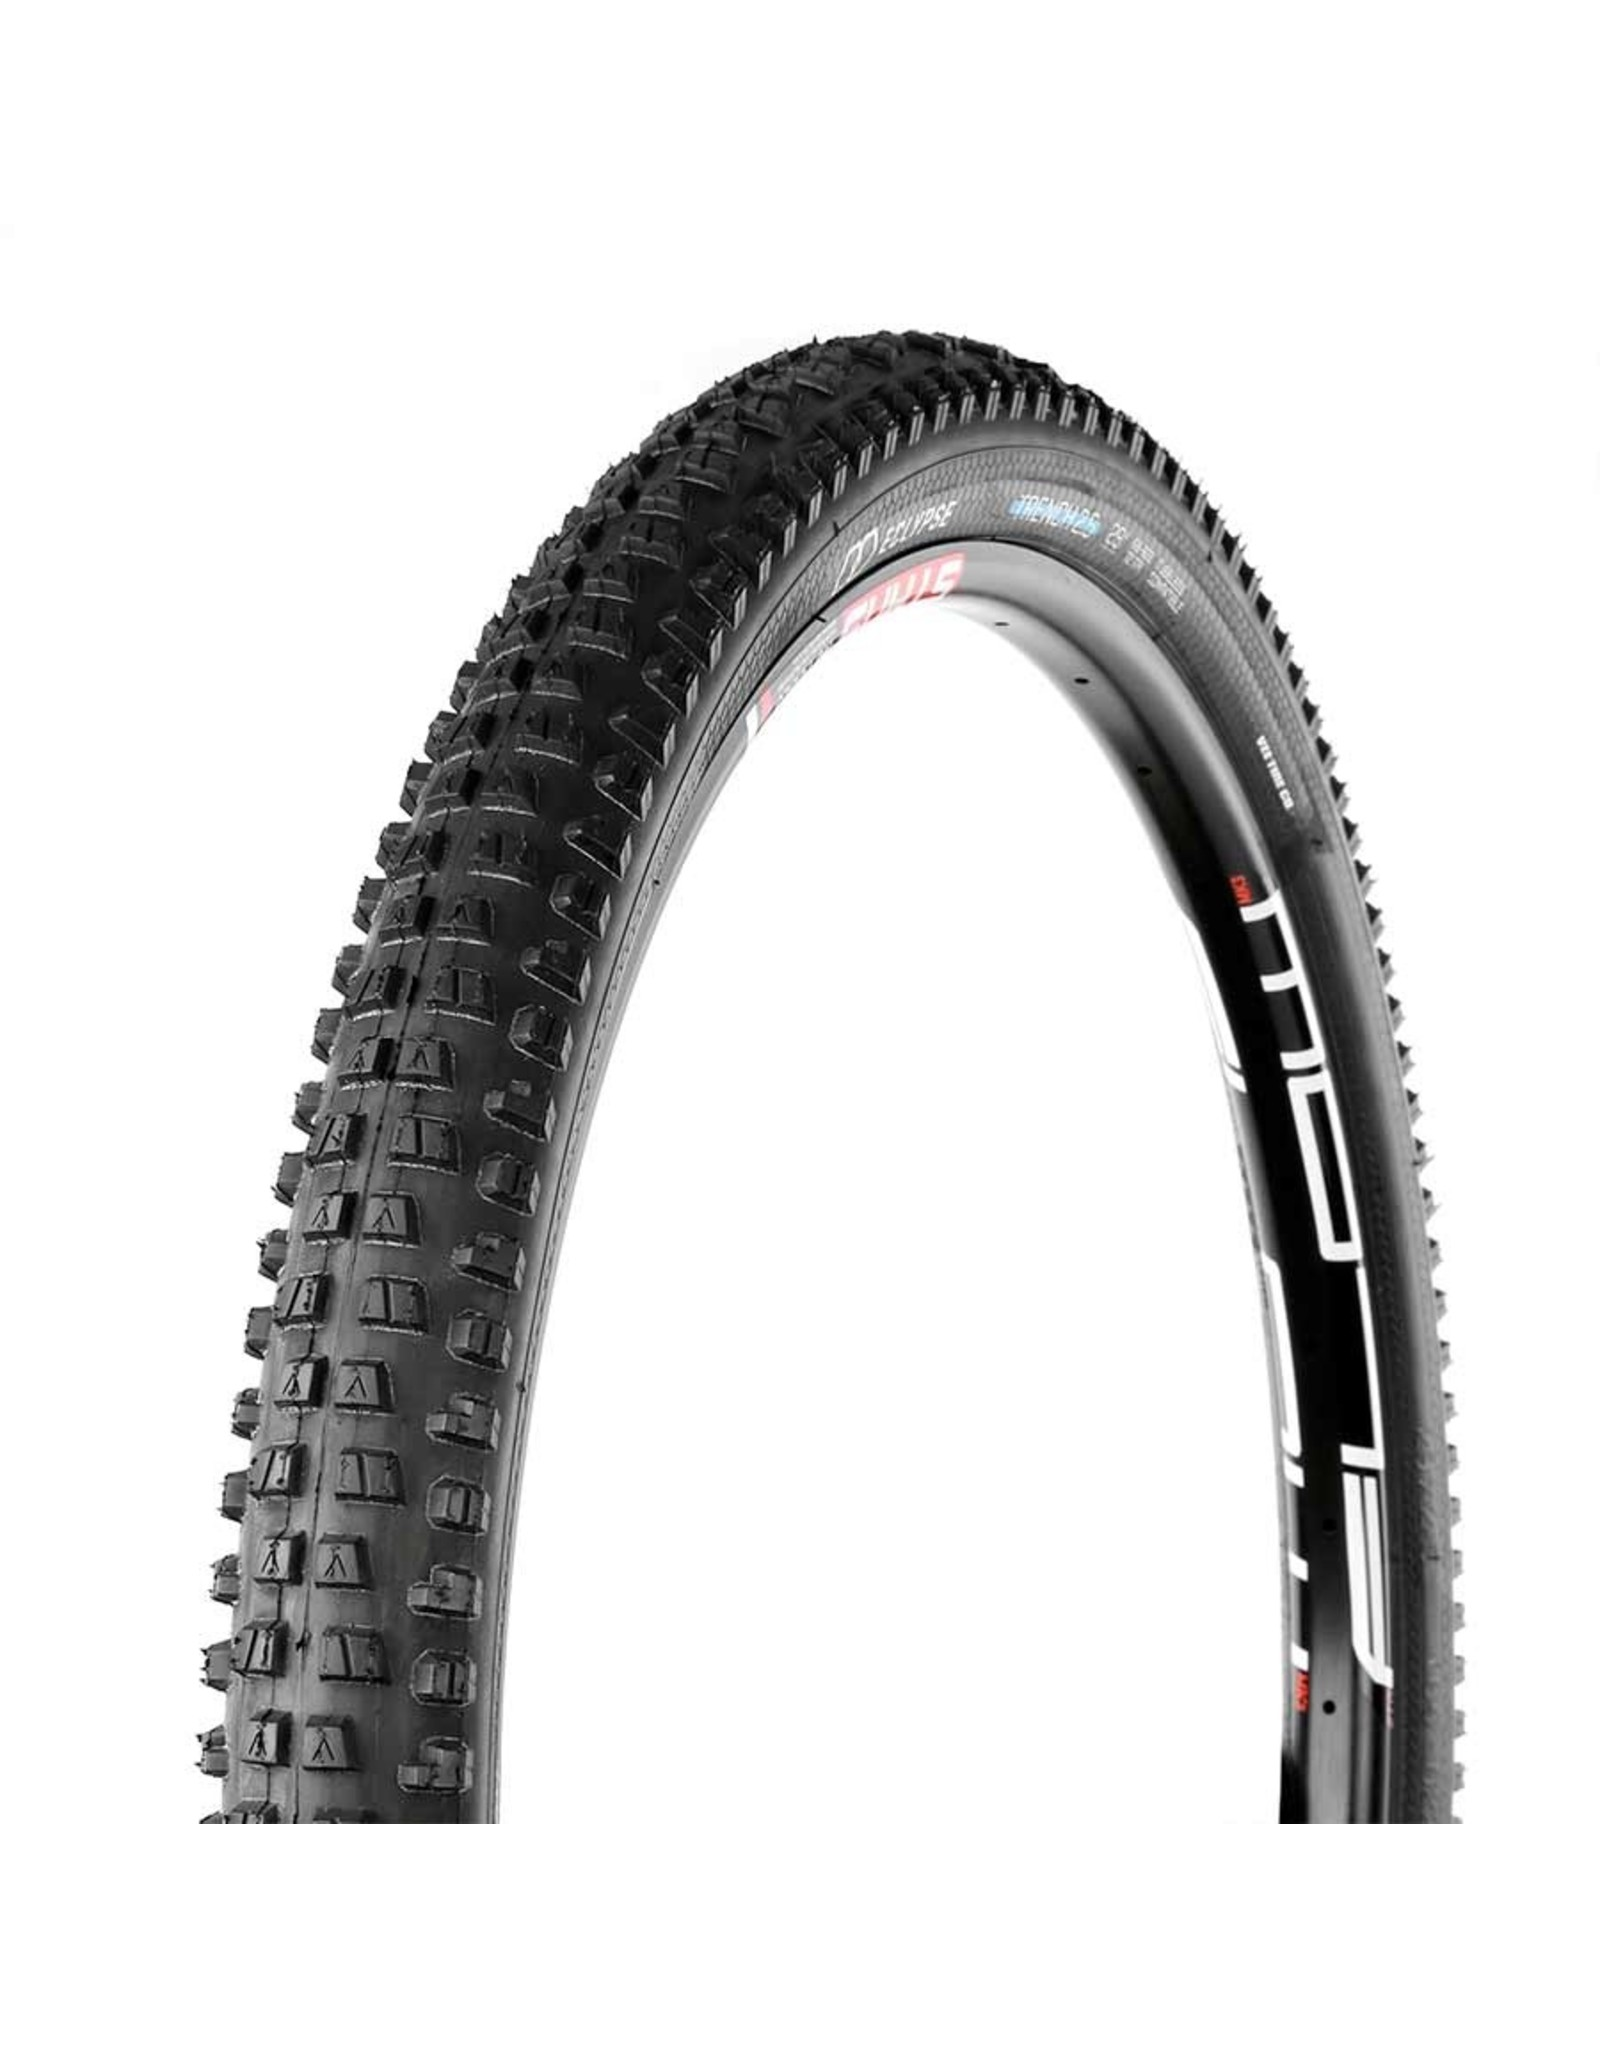 Eclypse, Trench™, Tire, 29''x2.50, Folding, 72TPI, Black